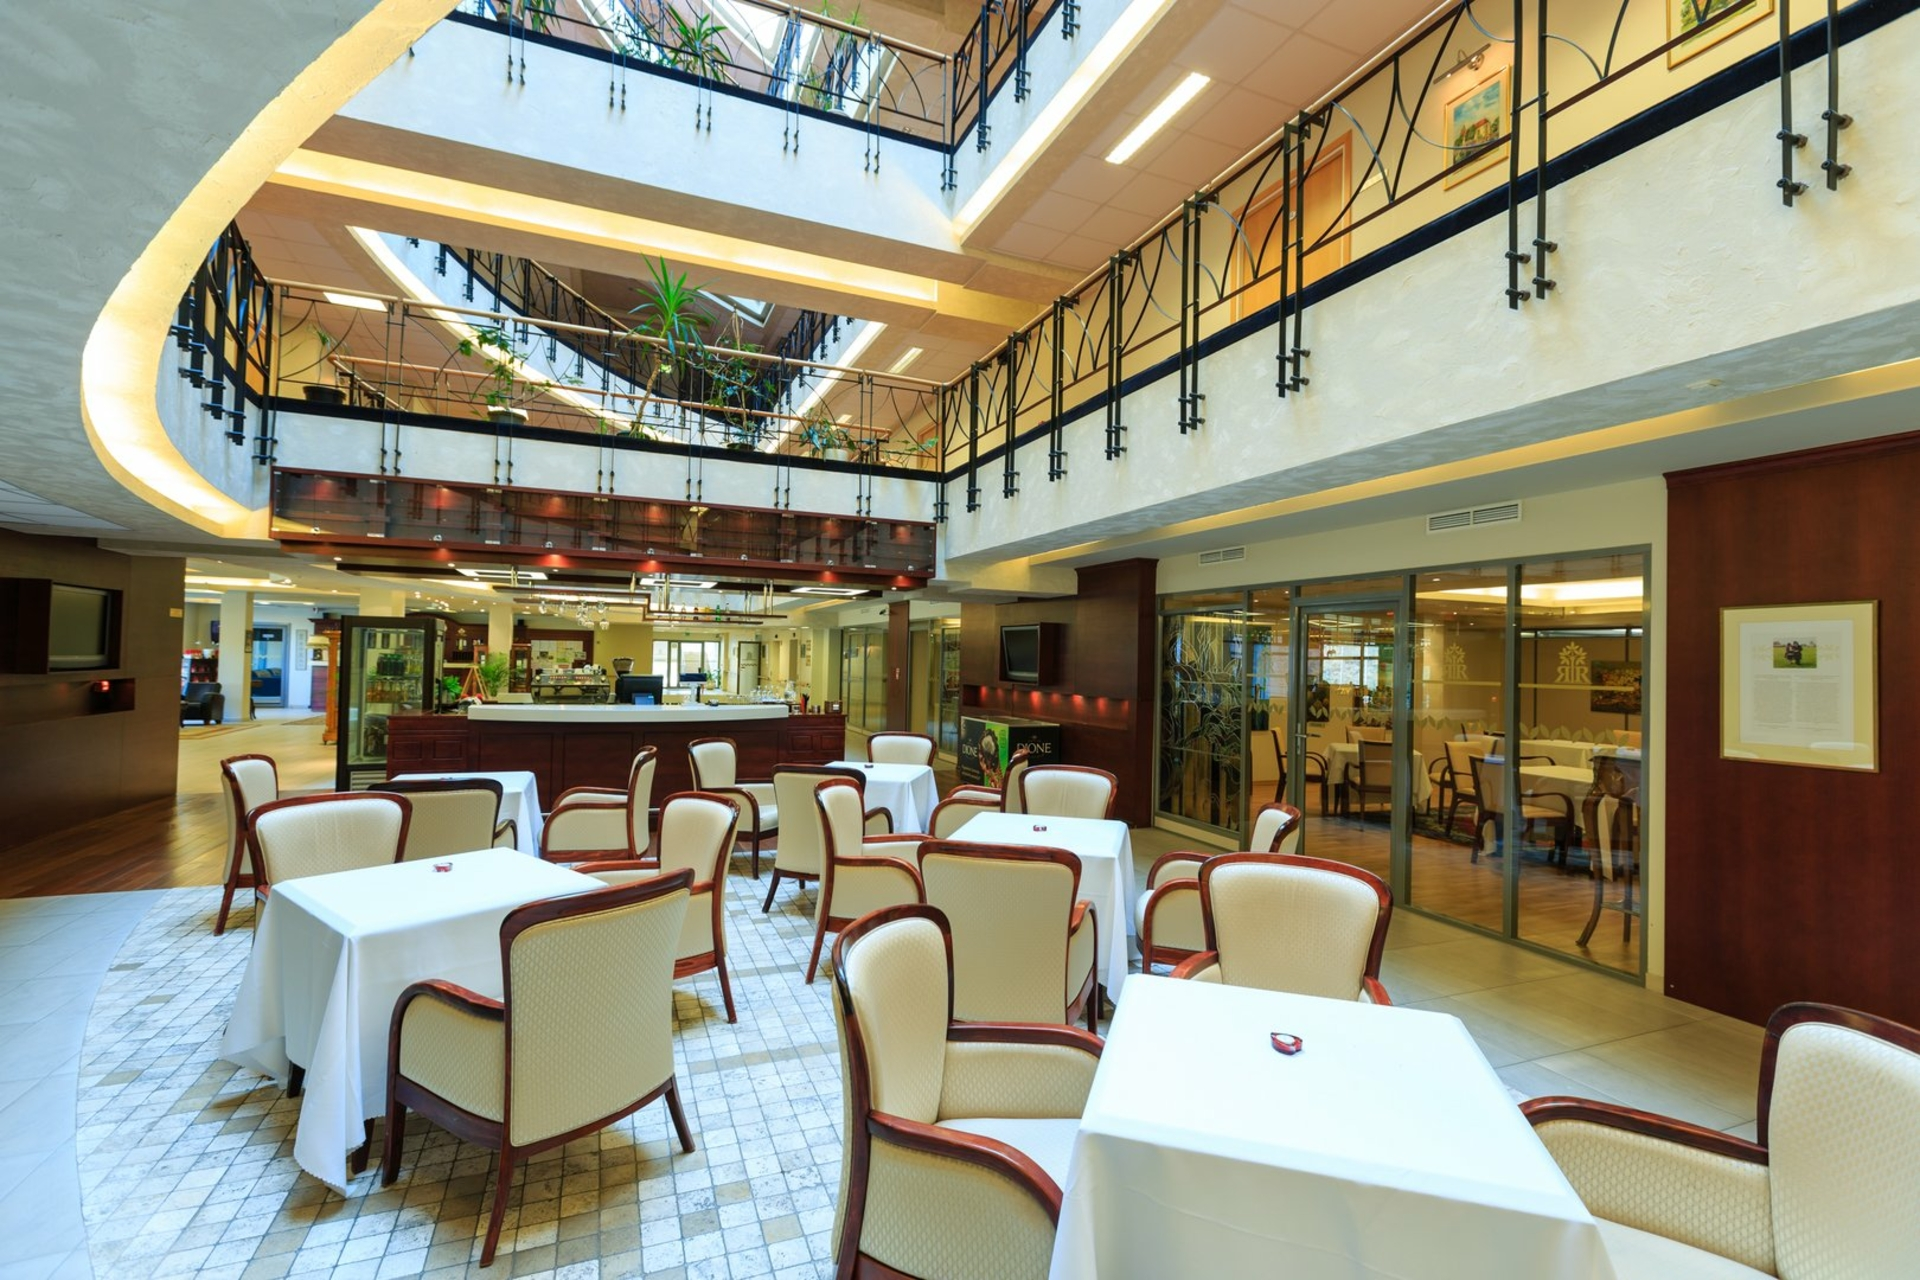 Hotel-restaurant \